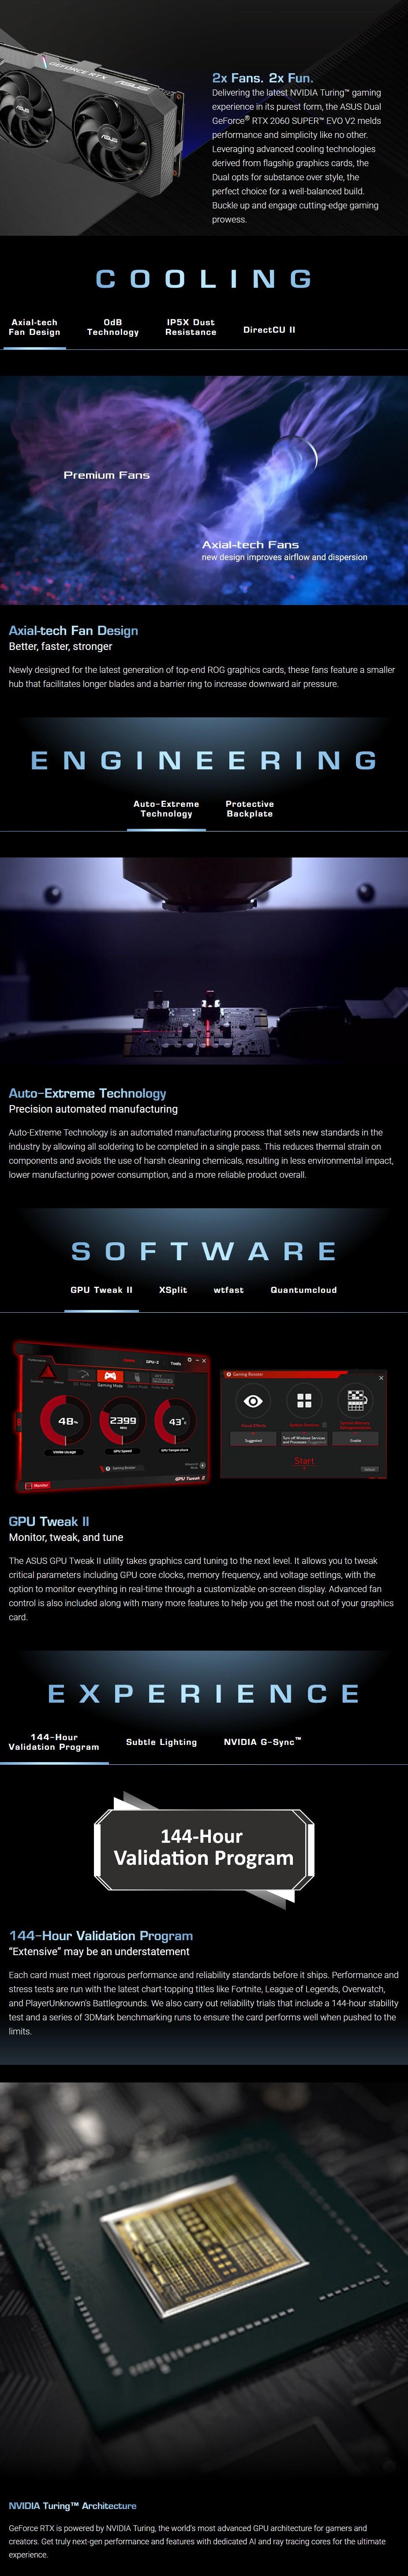 asus-geforce-rtx-2060-super-dual-evo-oc-v2-8gb-video-card-ac33955-8.jpg